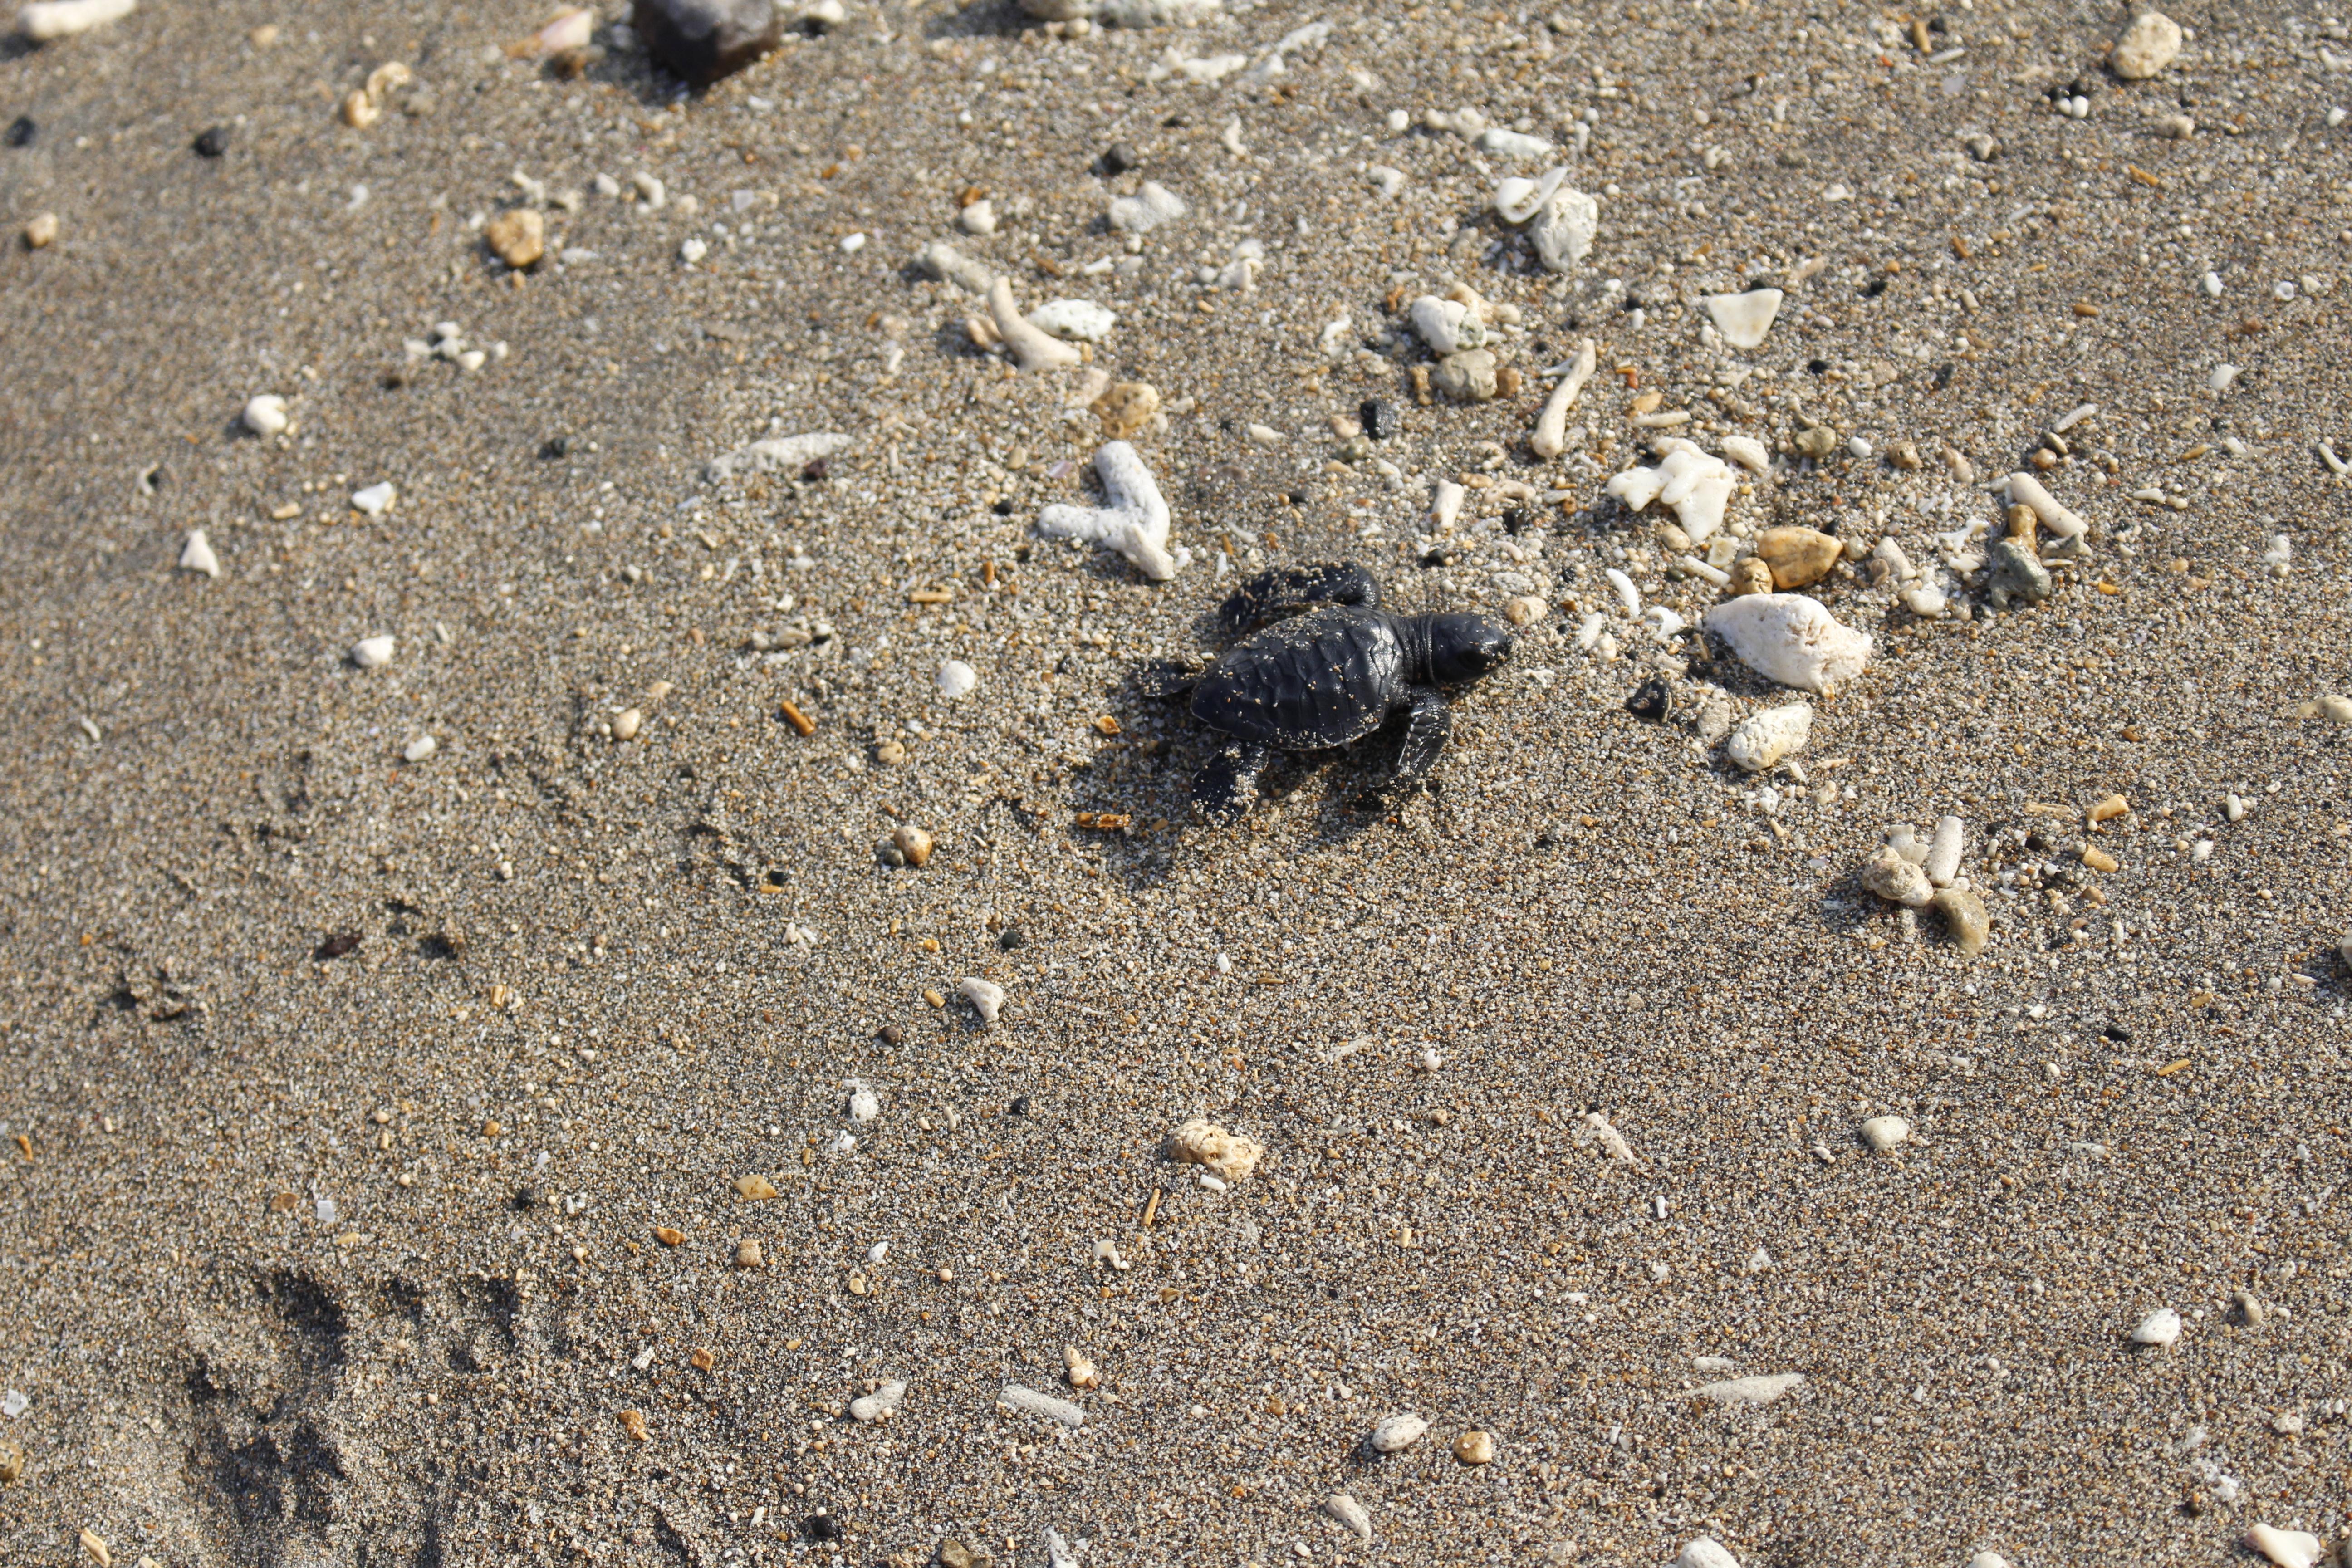 https://highend-traveller.com/baby-turtle-release-at-the-anvaya-beach-resort-bali/